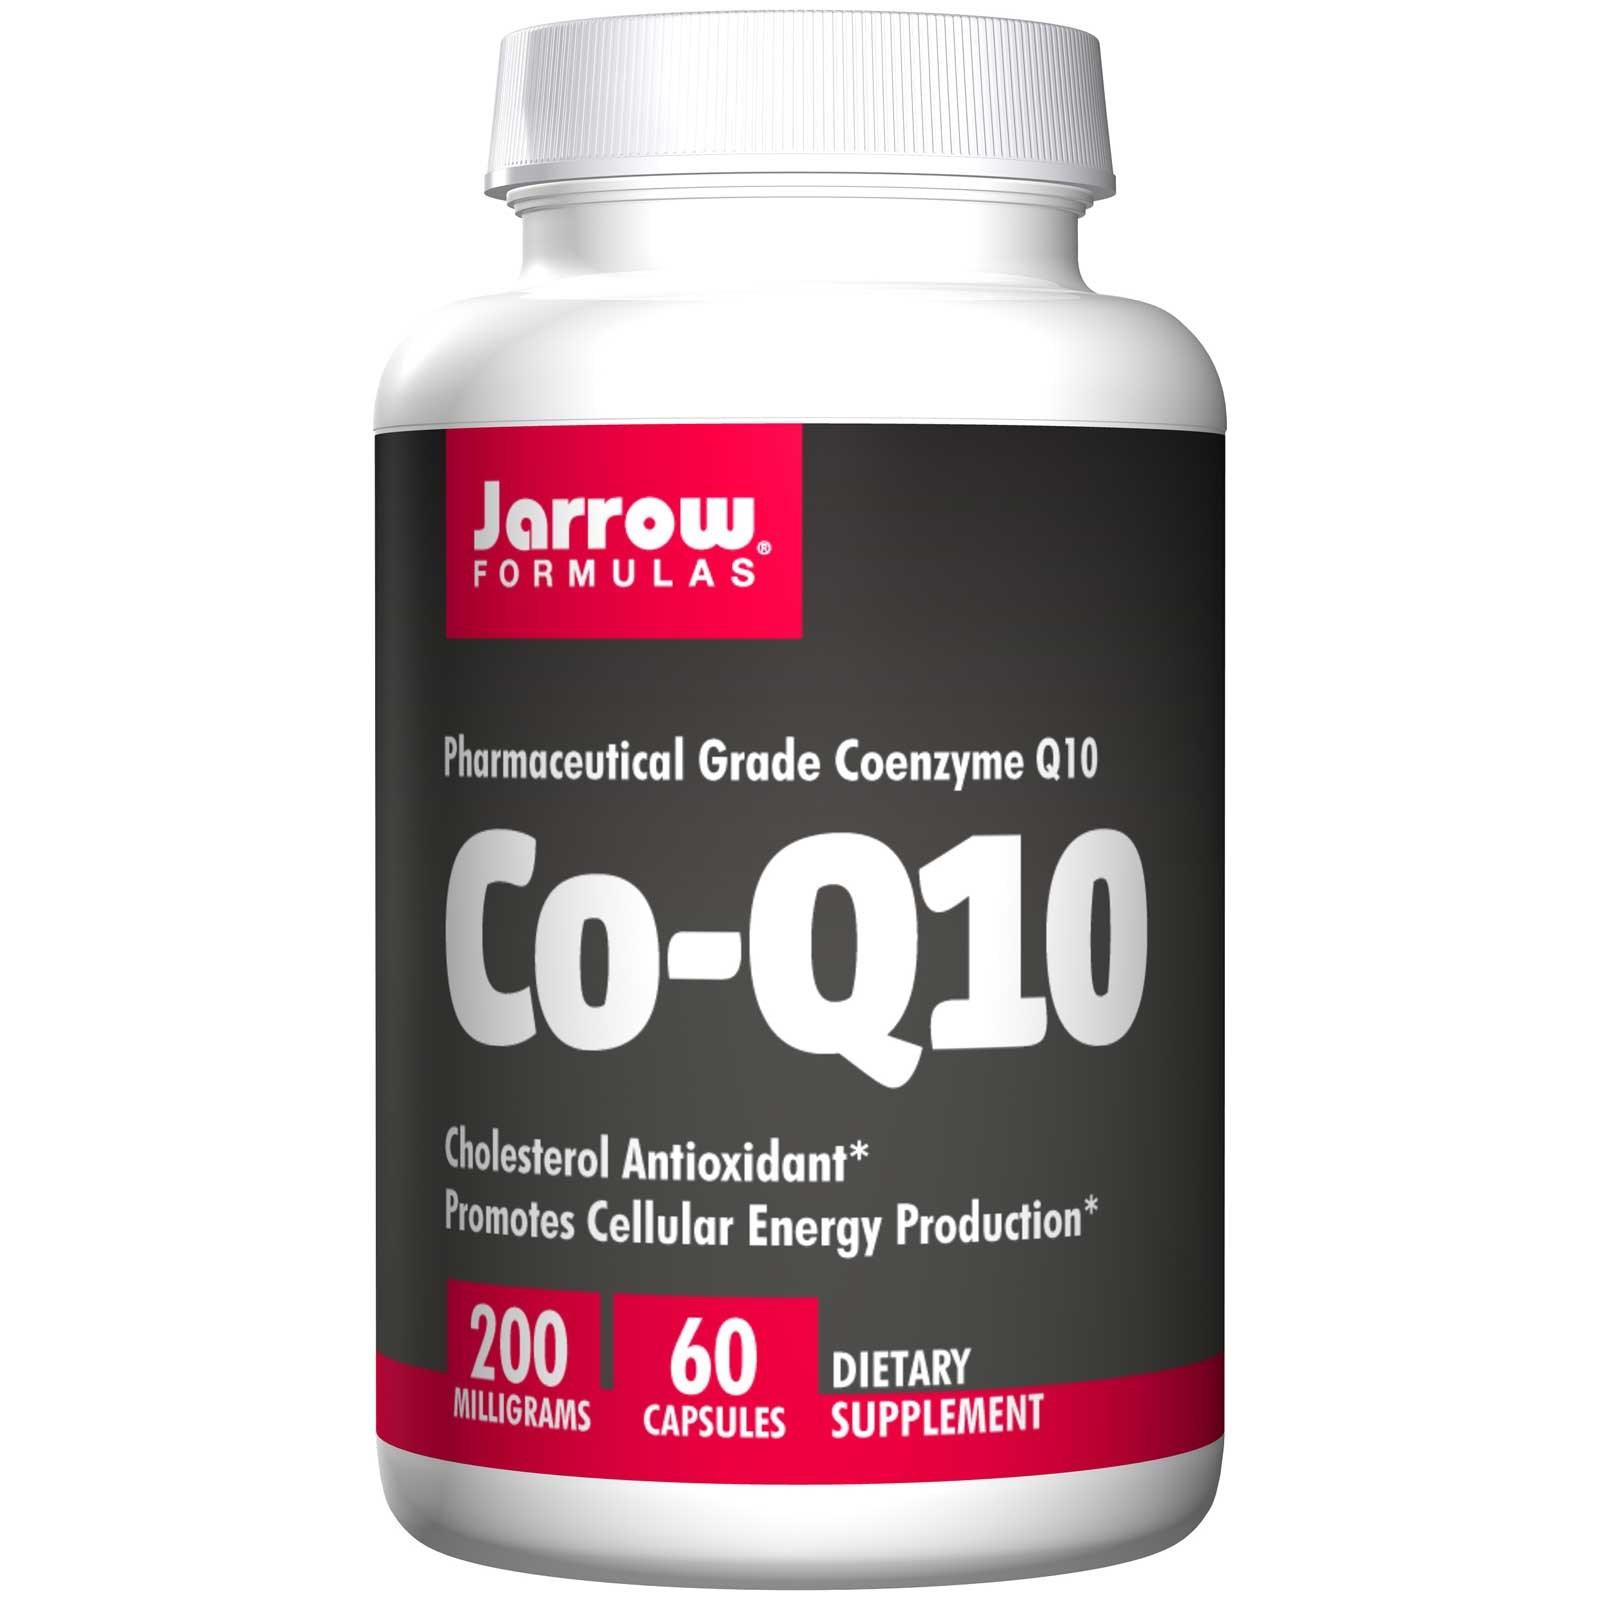 Image of Co-Q10 200, 200 mg (60 Capsules) - Jarrow Formulas 0790011060161